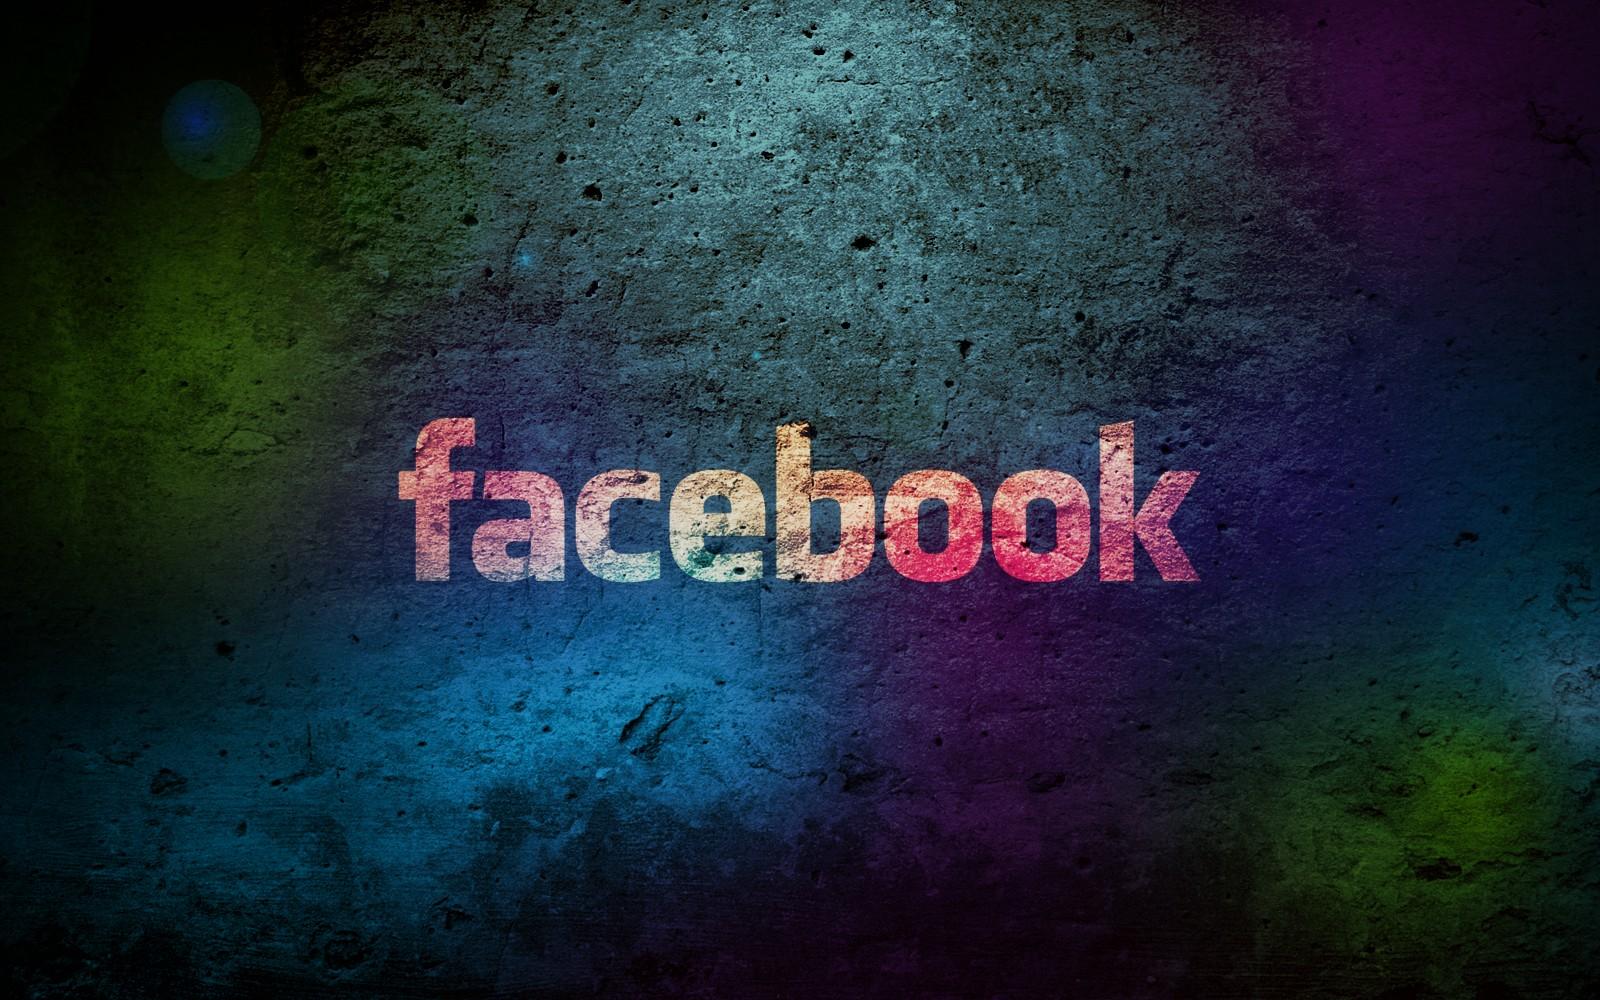 Creative wallpapers: Facebook wallpapers